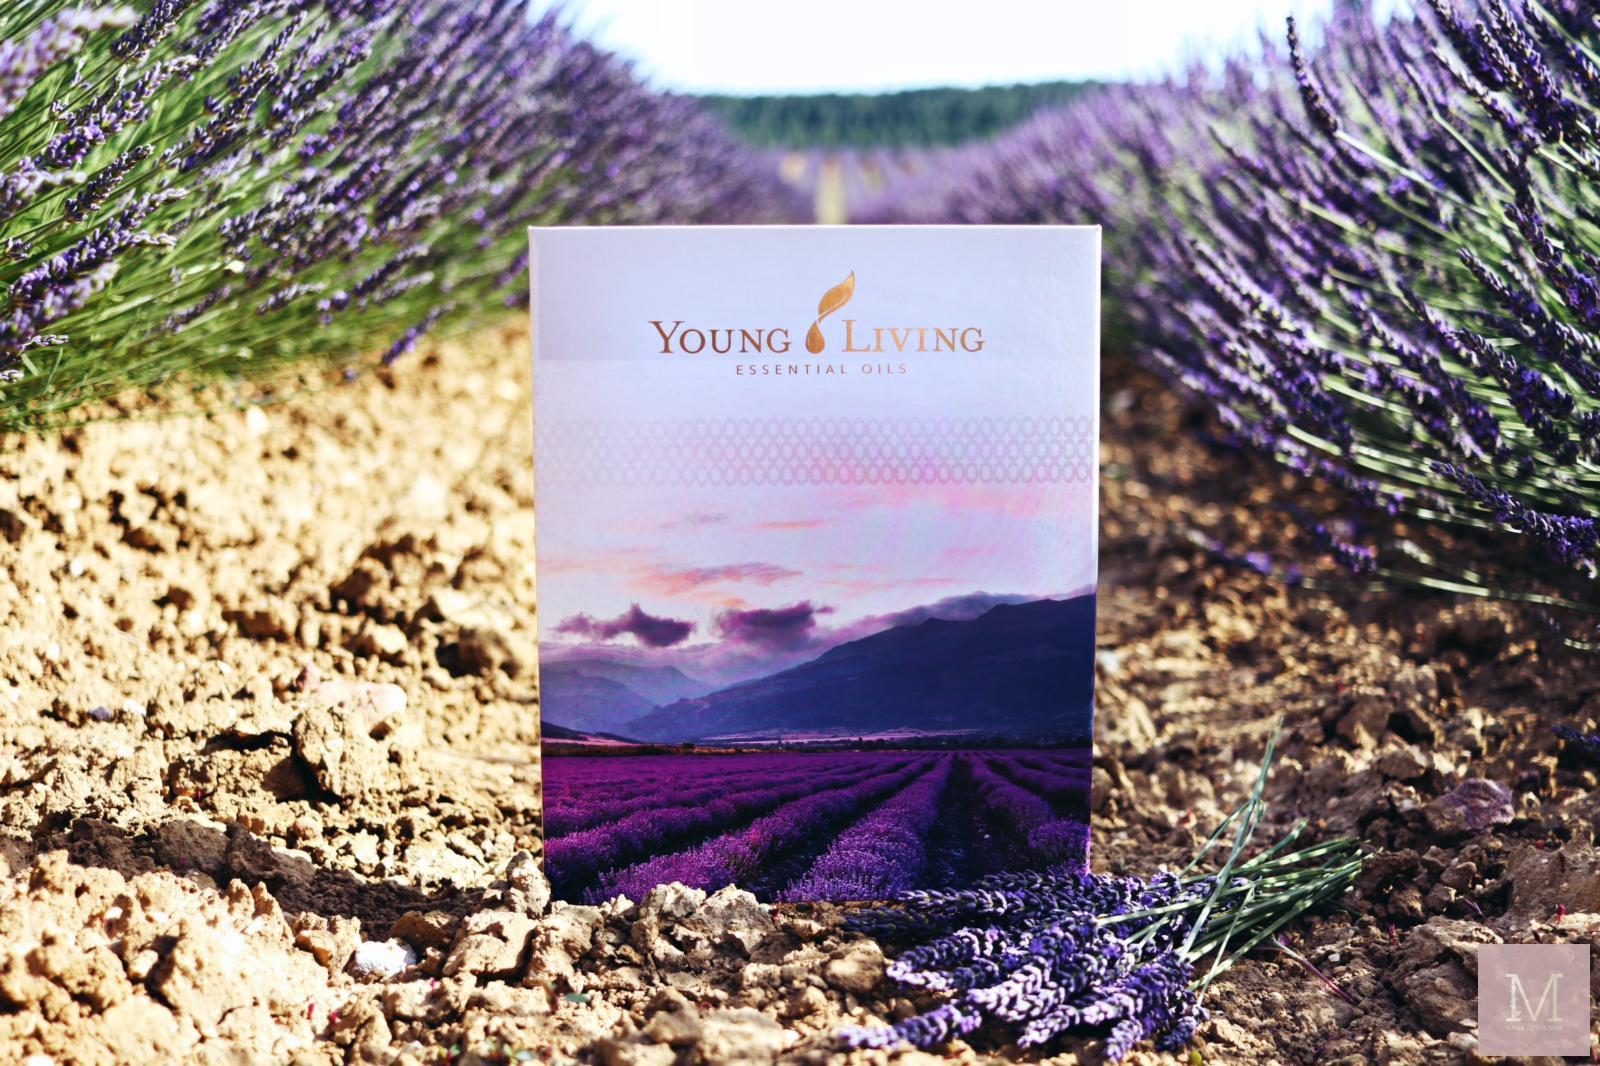 lavendelveld starterkit young living essentiele olie